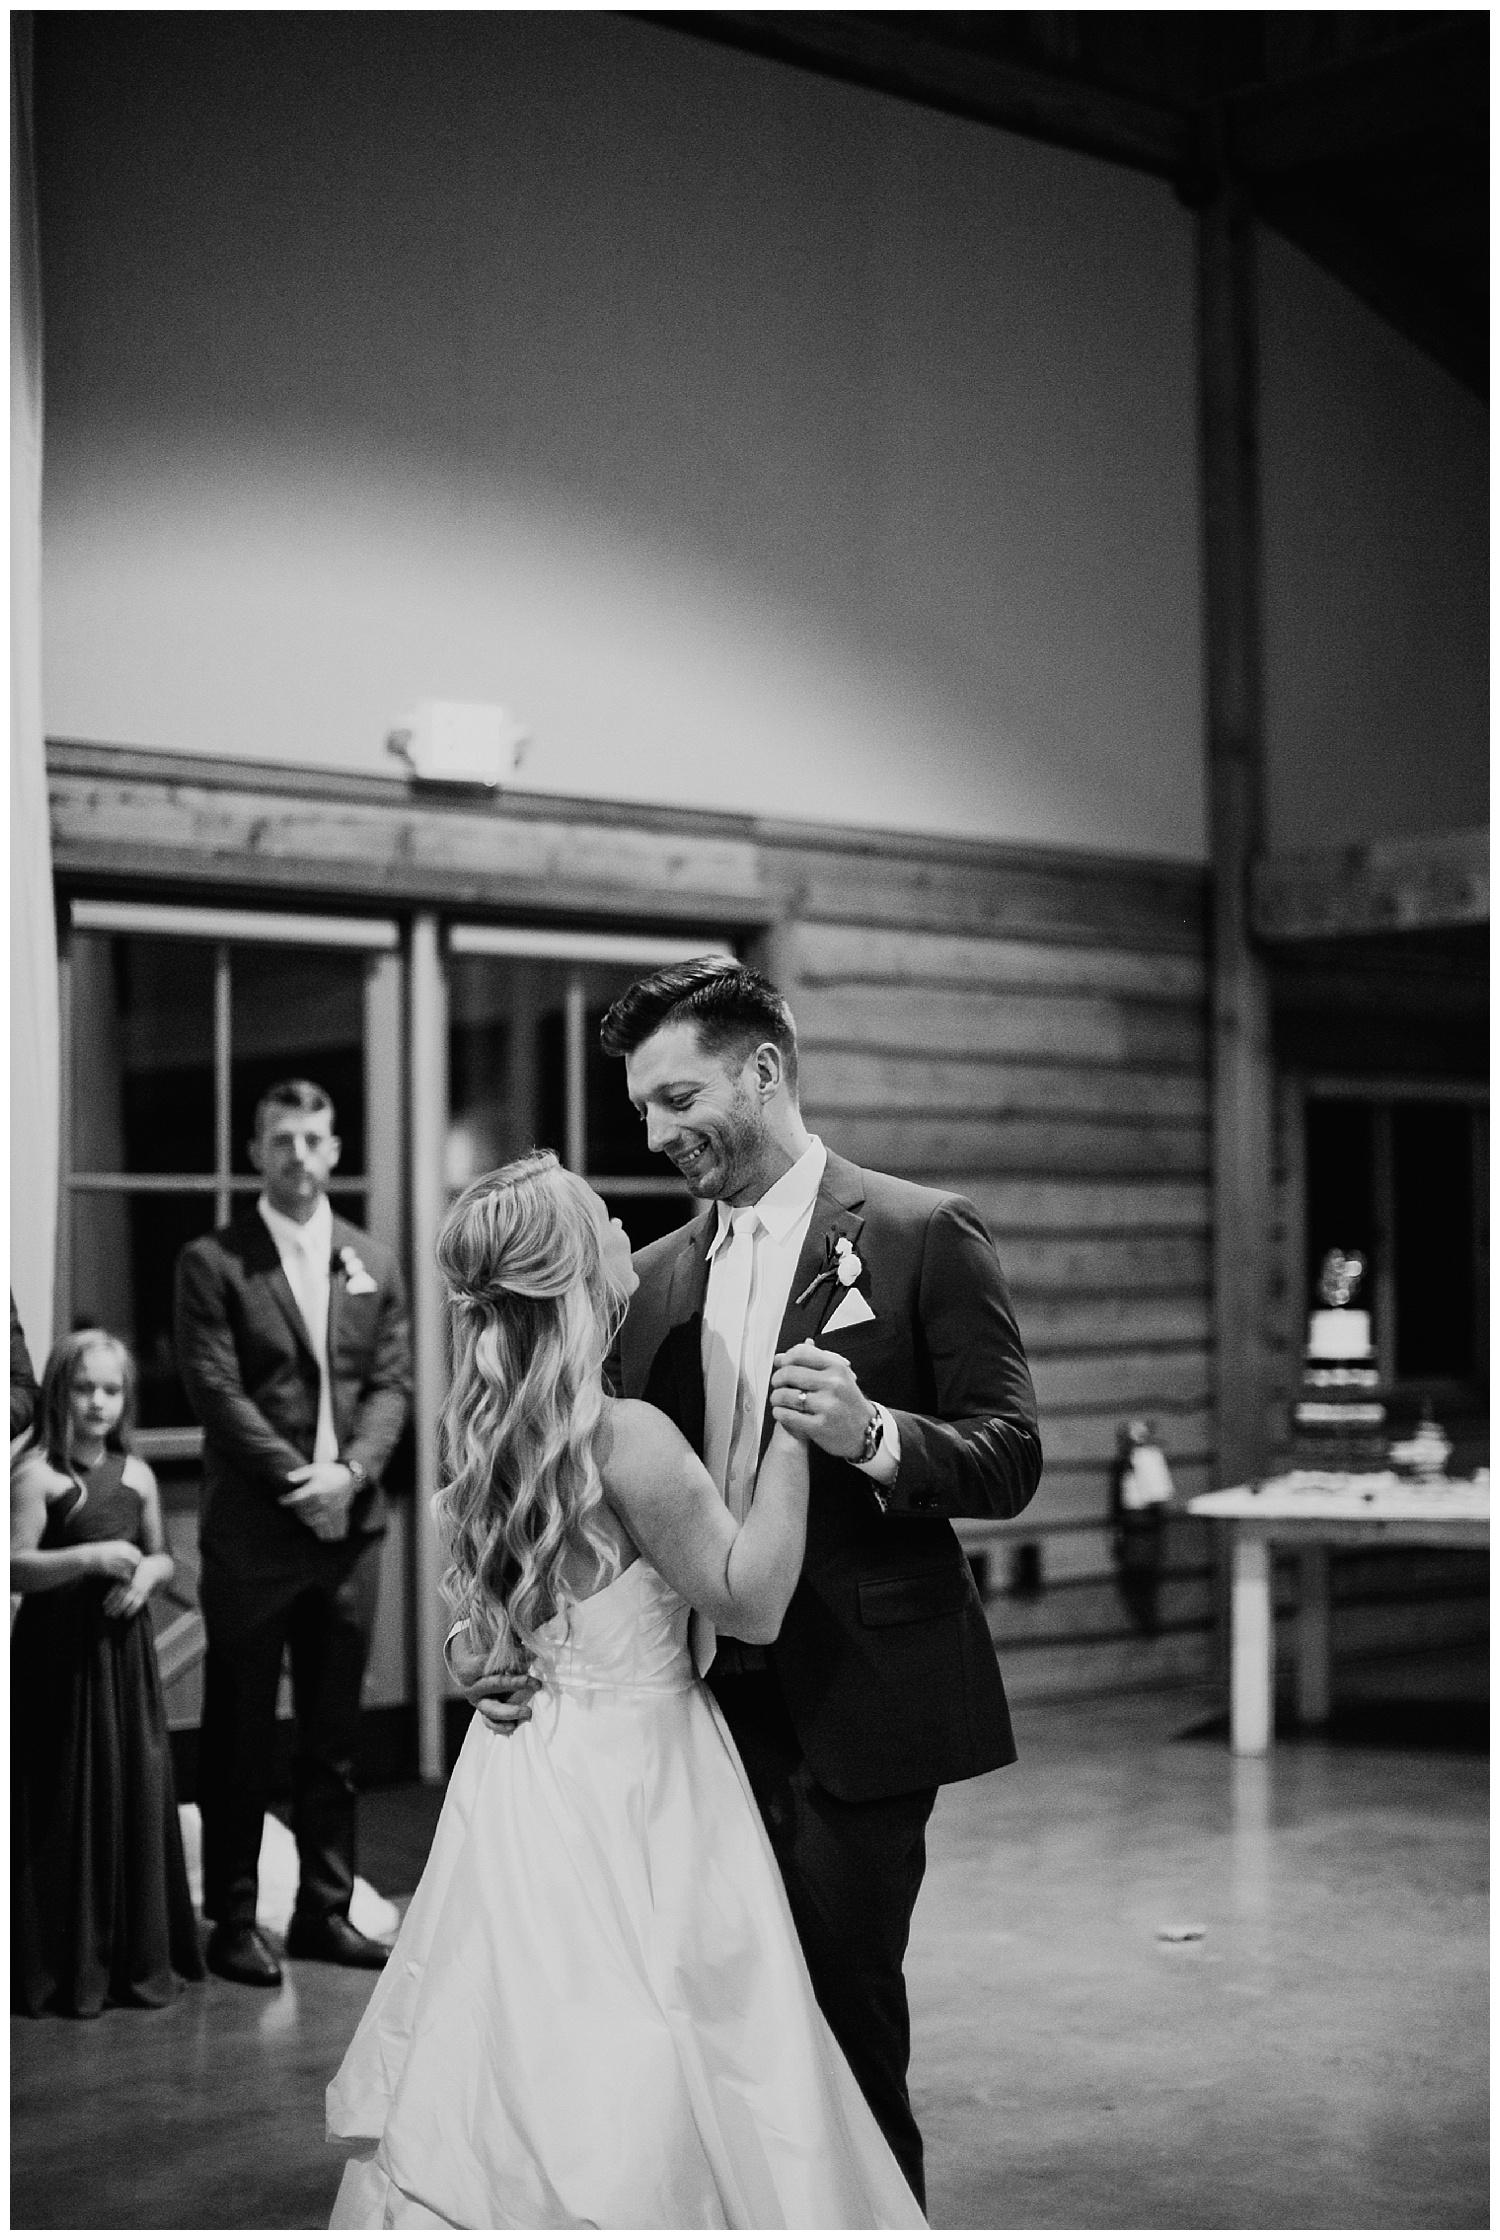 classy-wedding-sycamore_farms-nashville-tn2019-01-22_0075.jpg